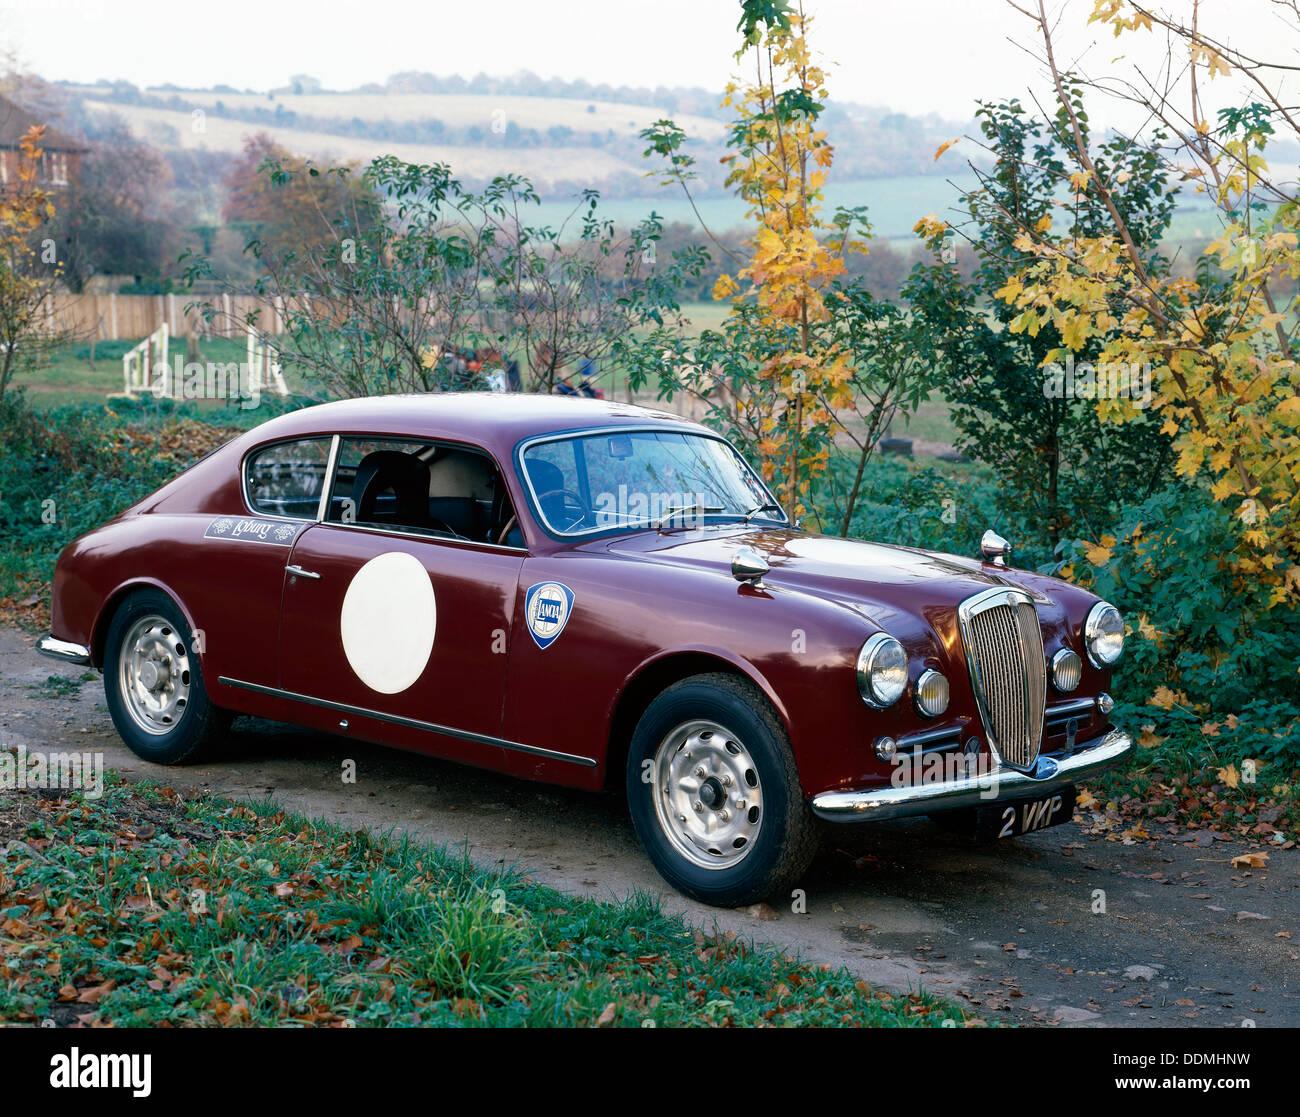 1953 Lancia Aurelia. - Stock Image